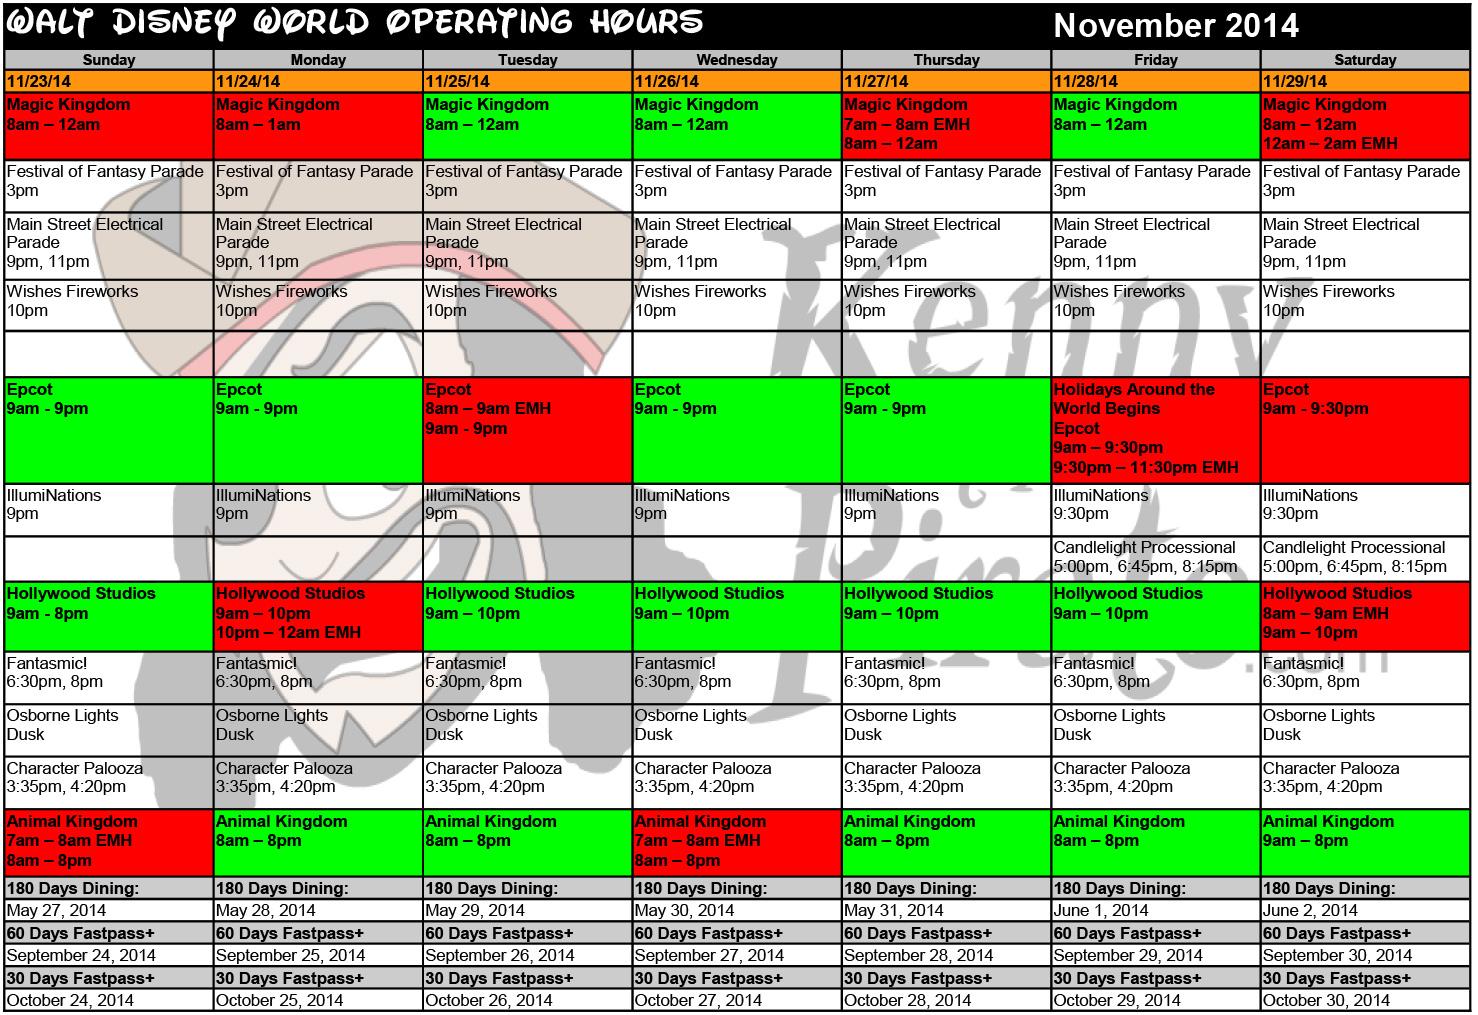 KennythePirate's November Walt Disney World Crowd Calendar with Dining and Fastpass+ Booking Dates